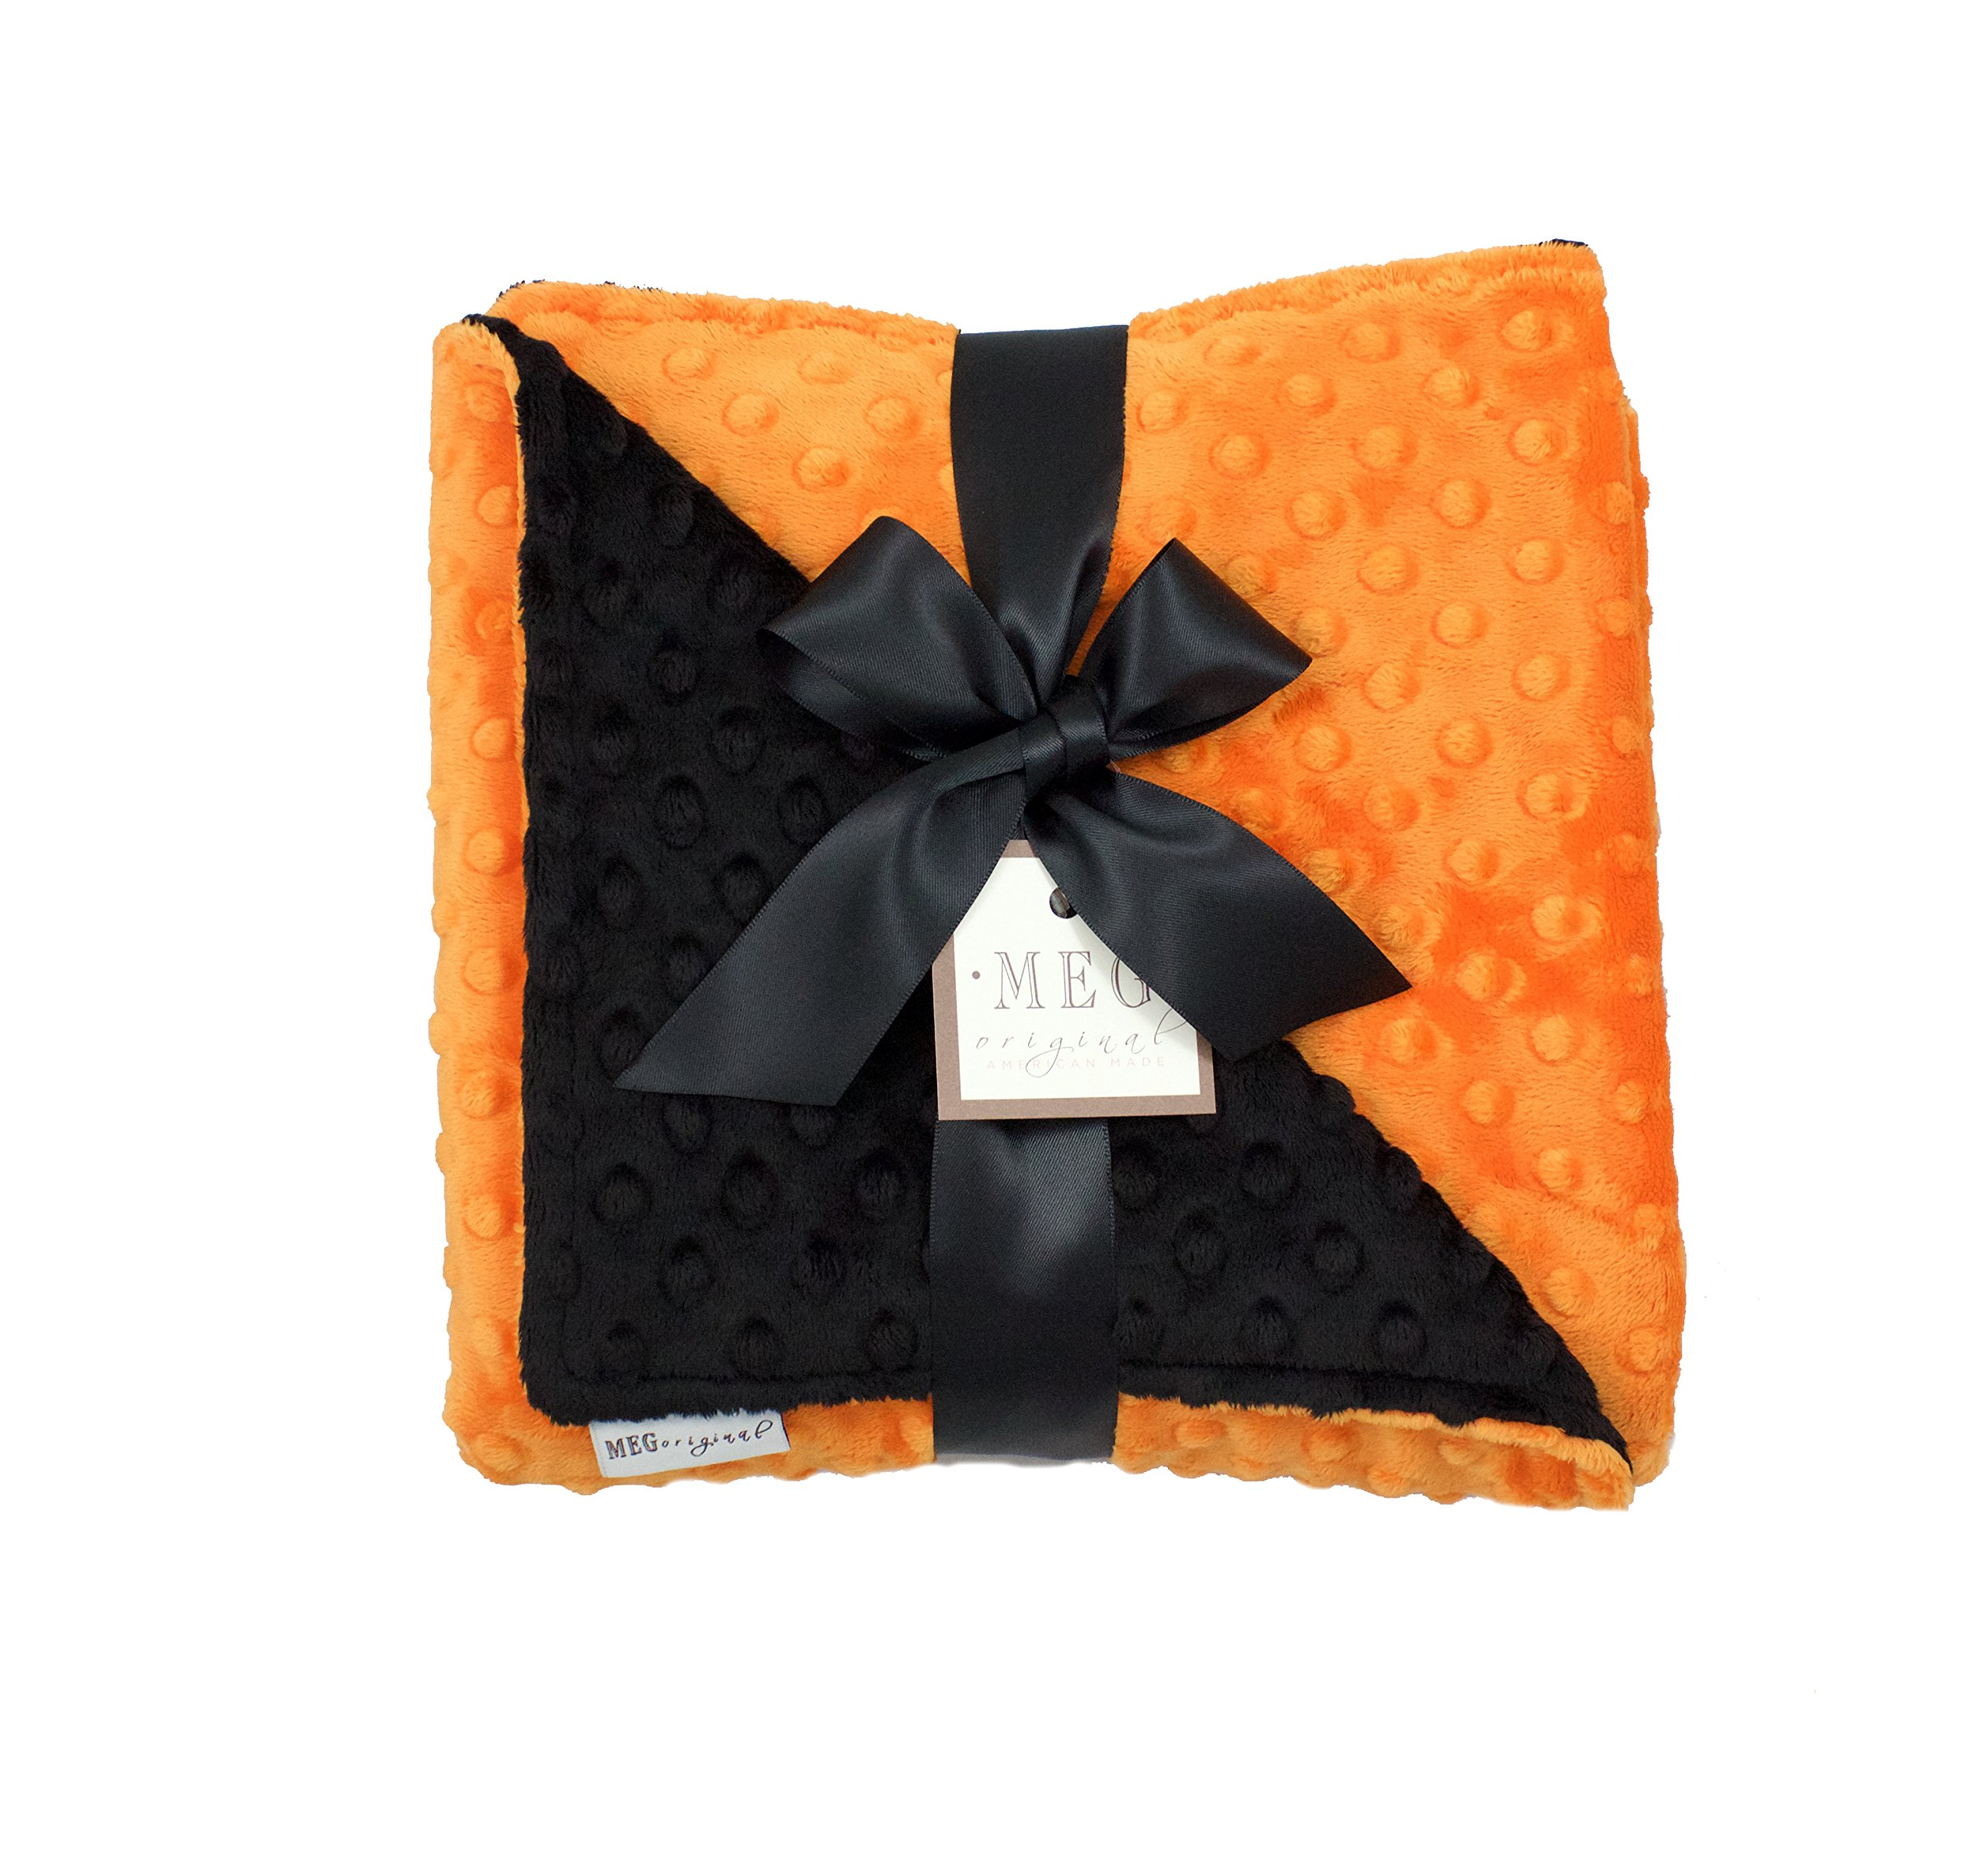 MEG Original Minky Dot Halloween Baby Blanket, Orange & Black 346 by MEG Original